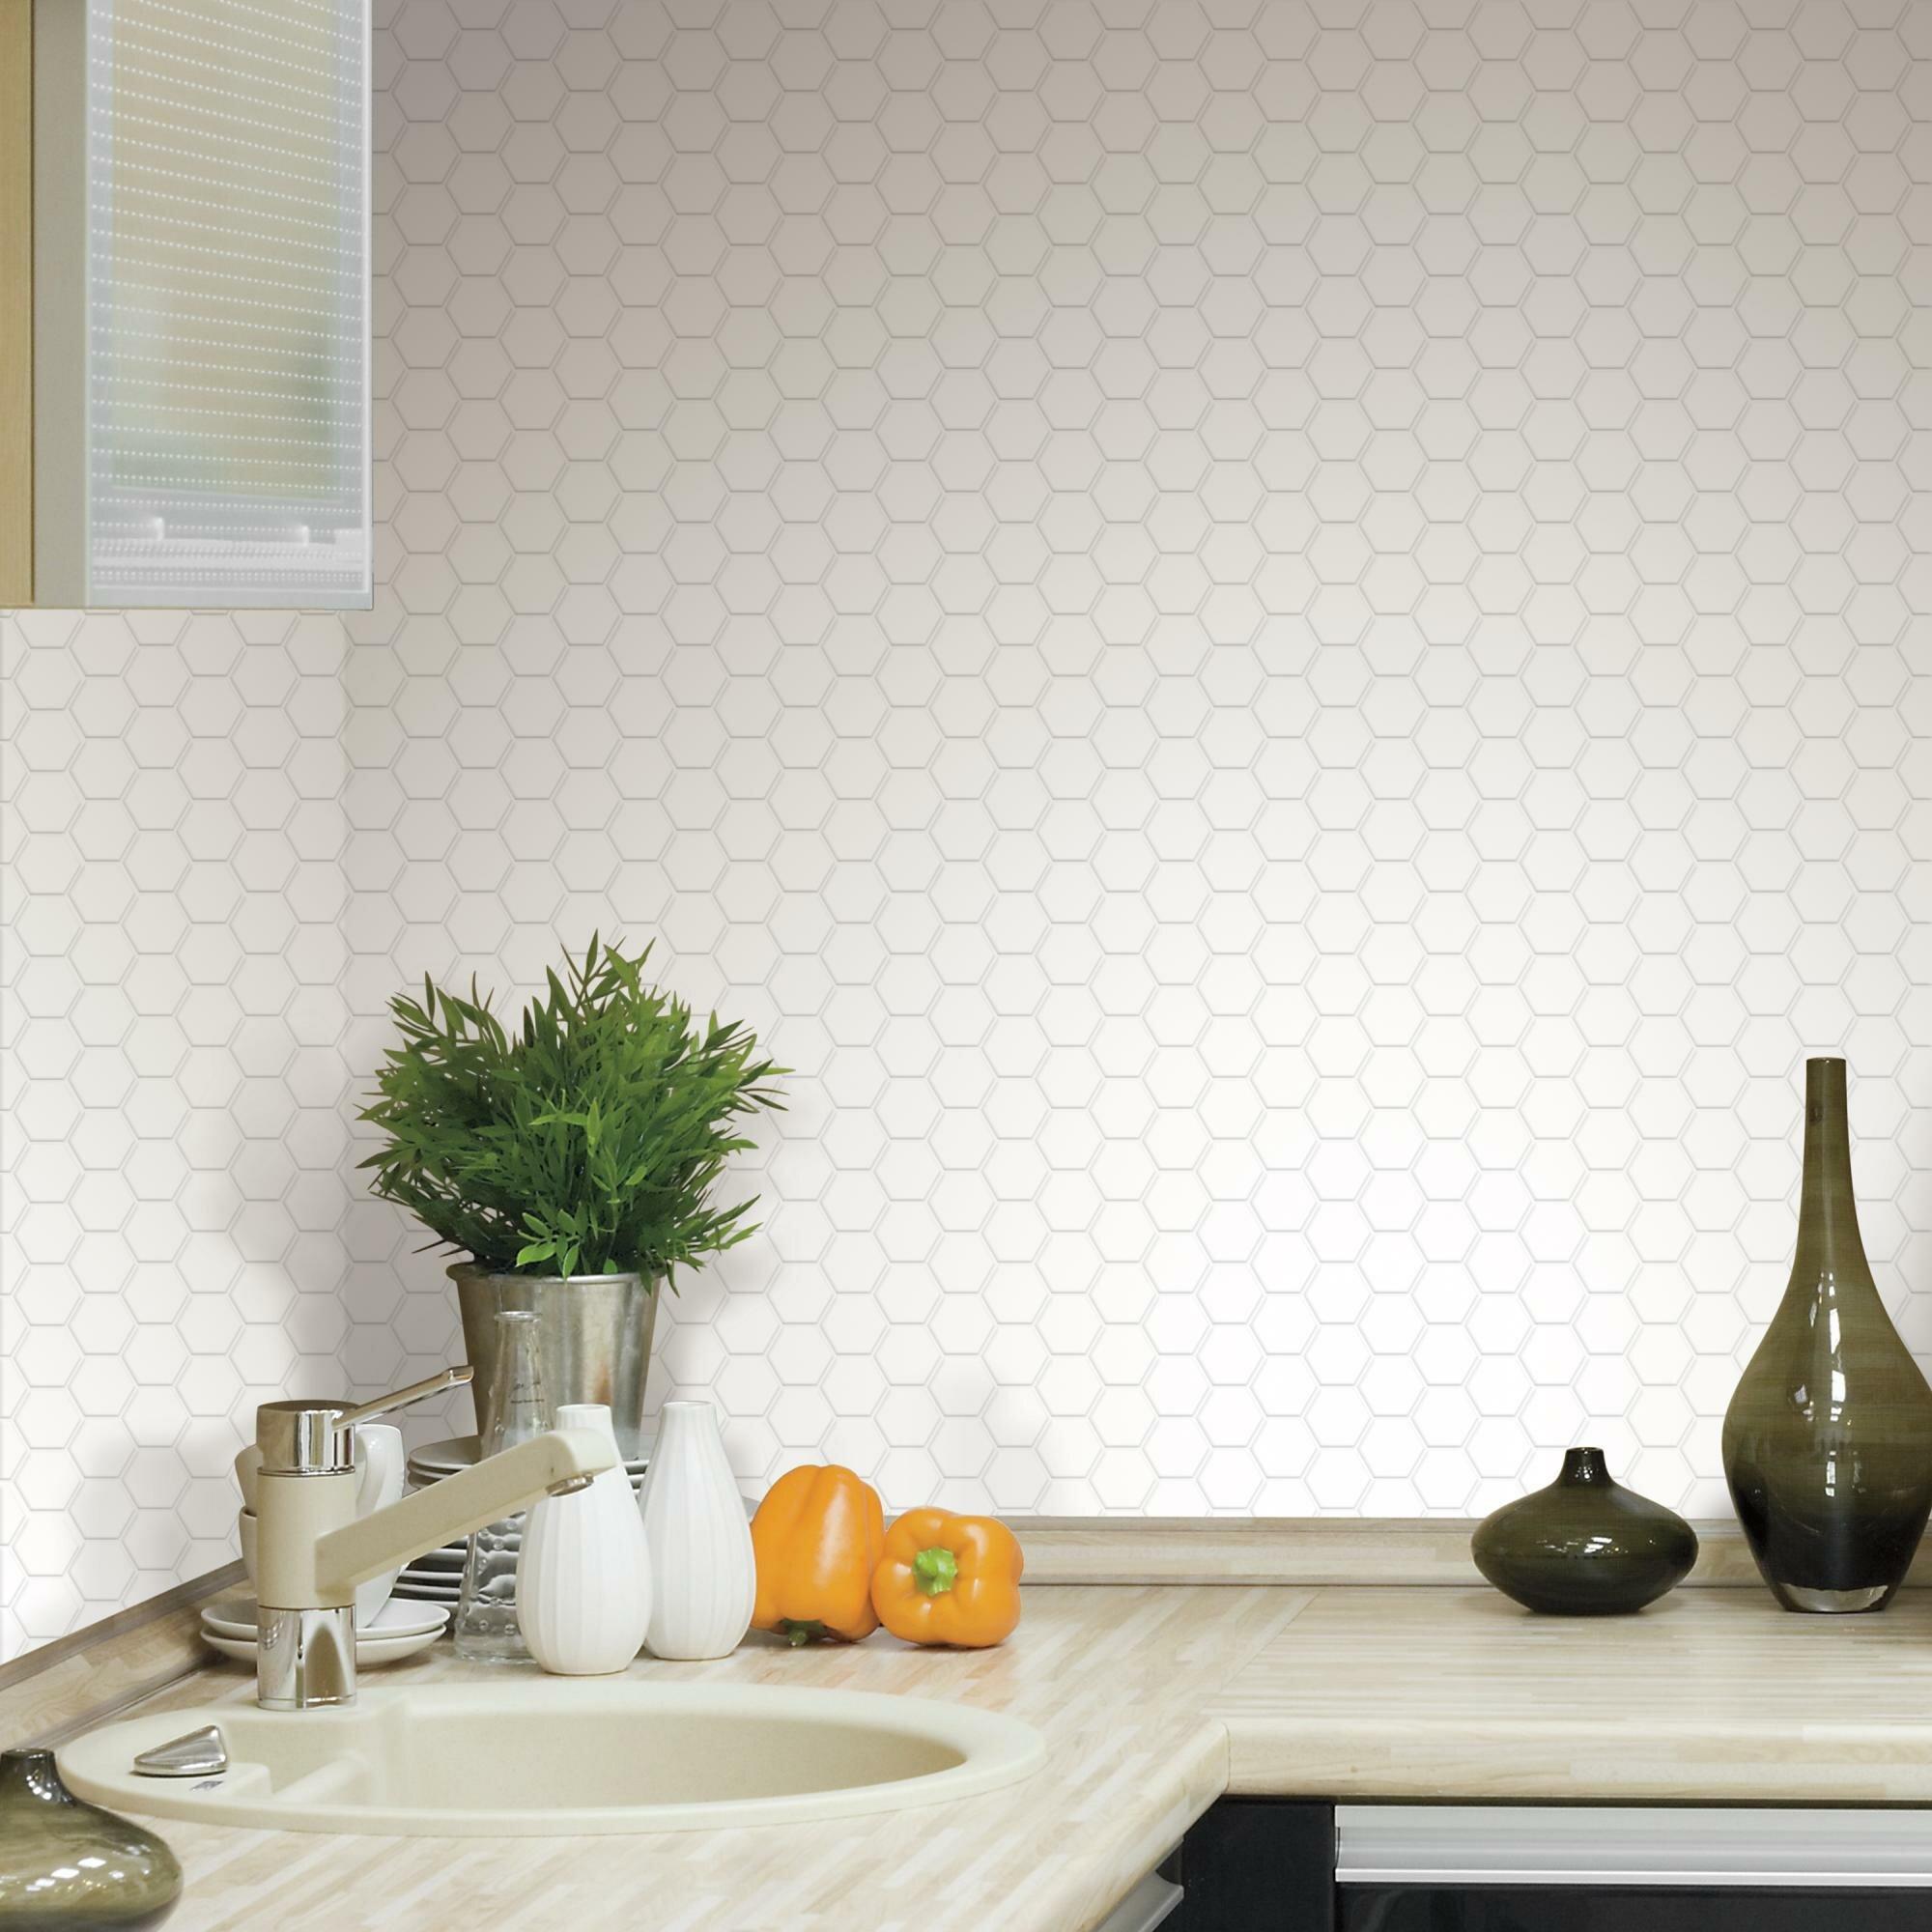 "- Room Mates Hexagon 10.5"" X 10.5"" PVC Peel & Stick Mosaic Tile In"